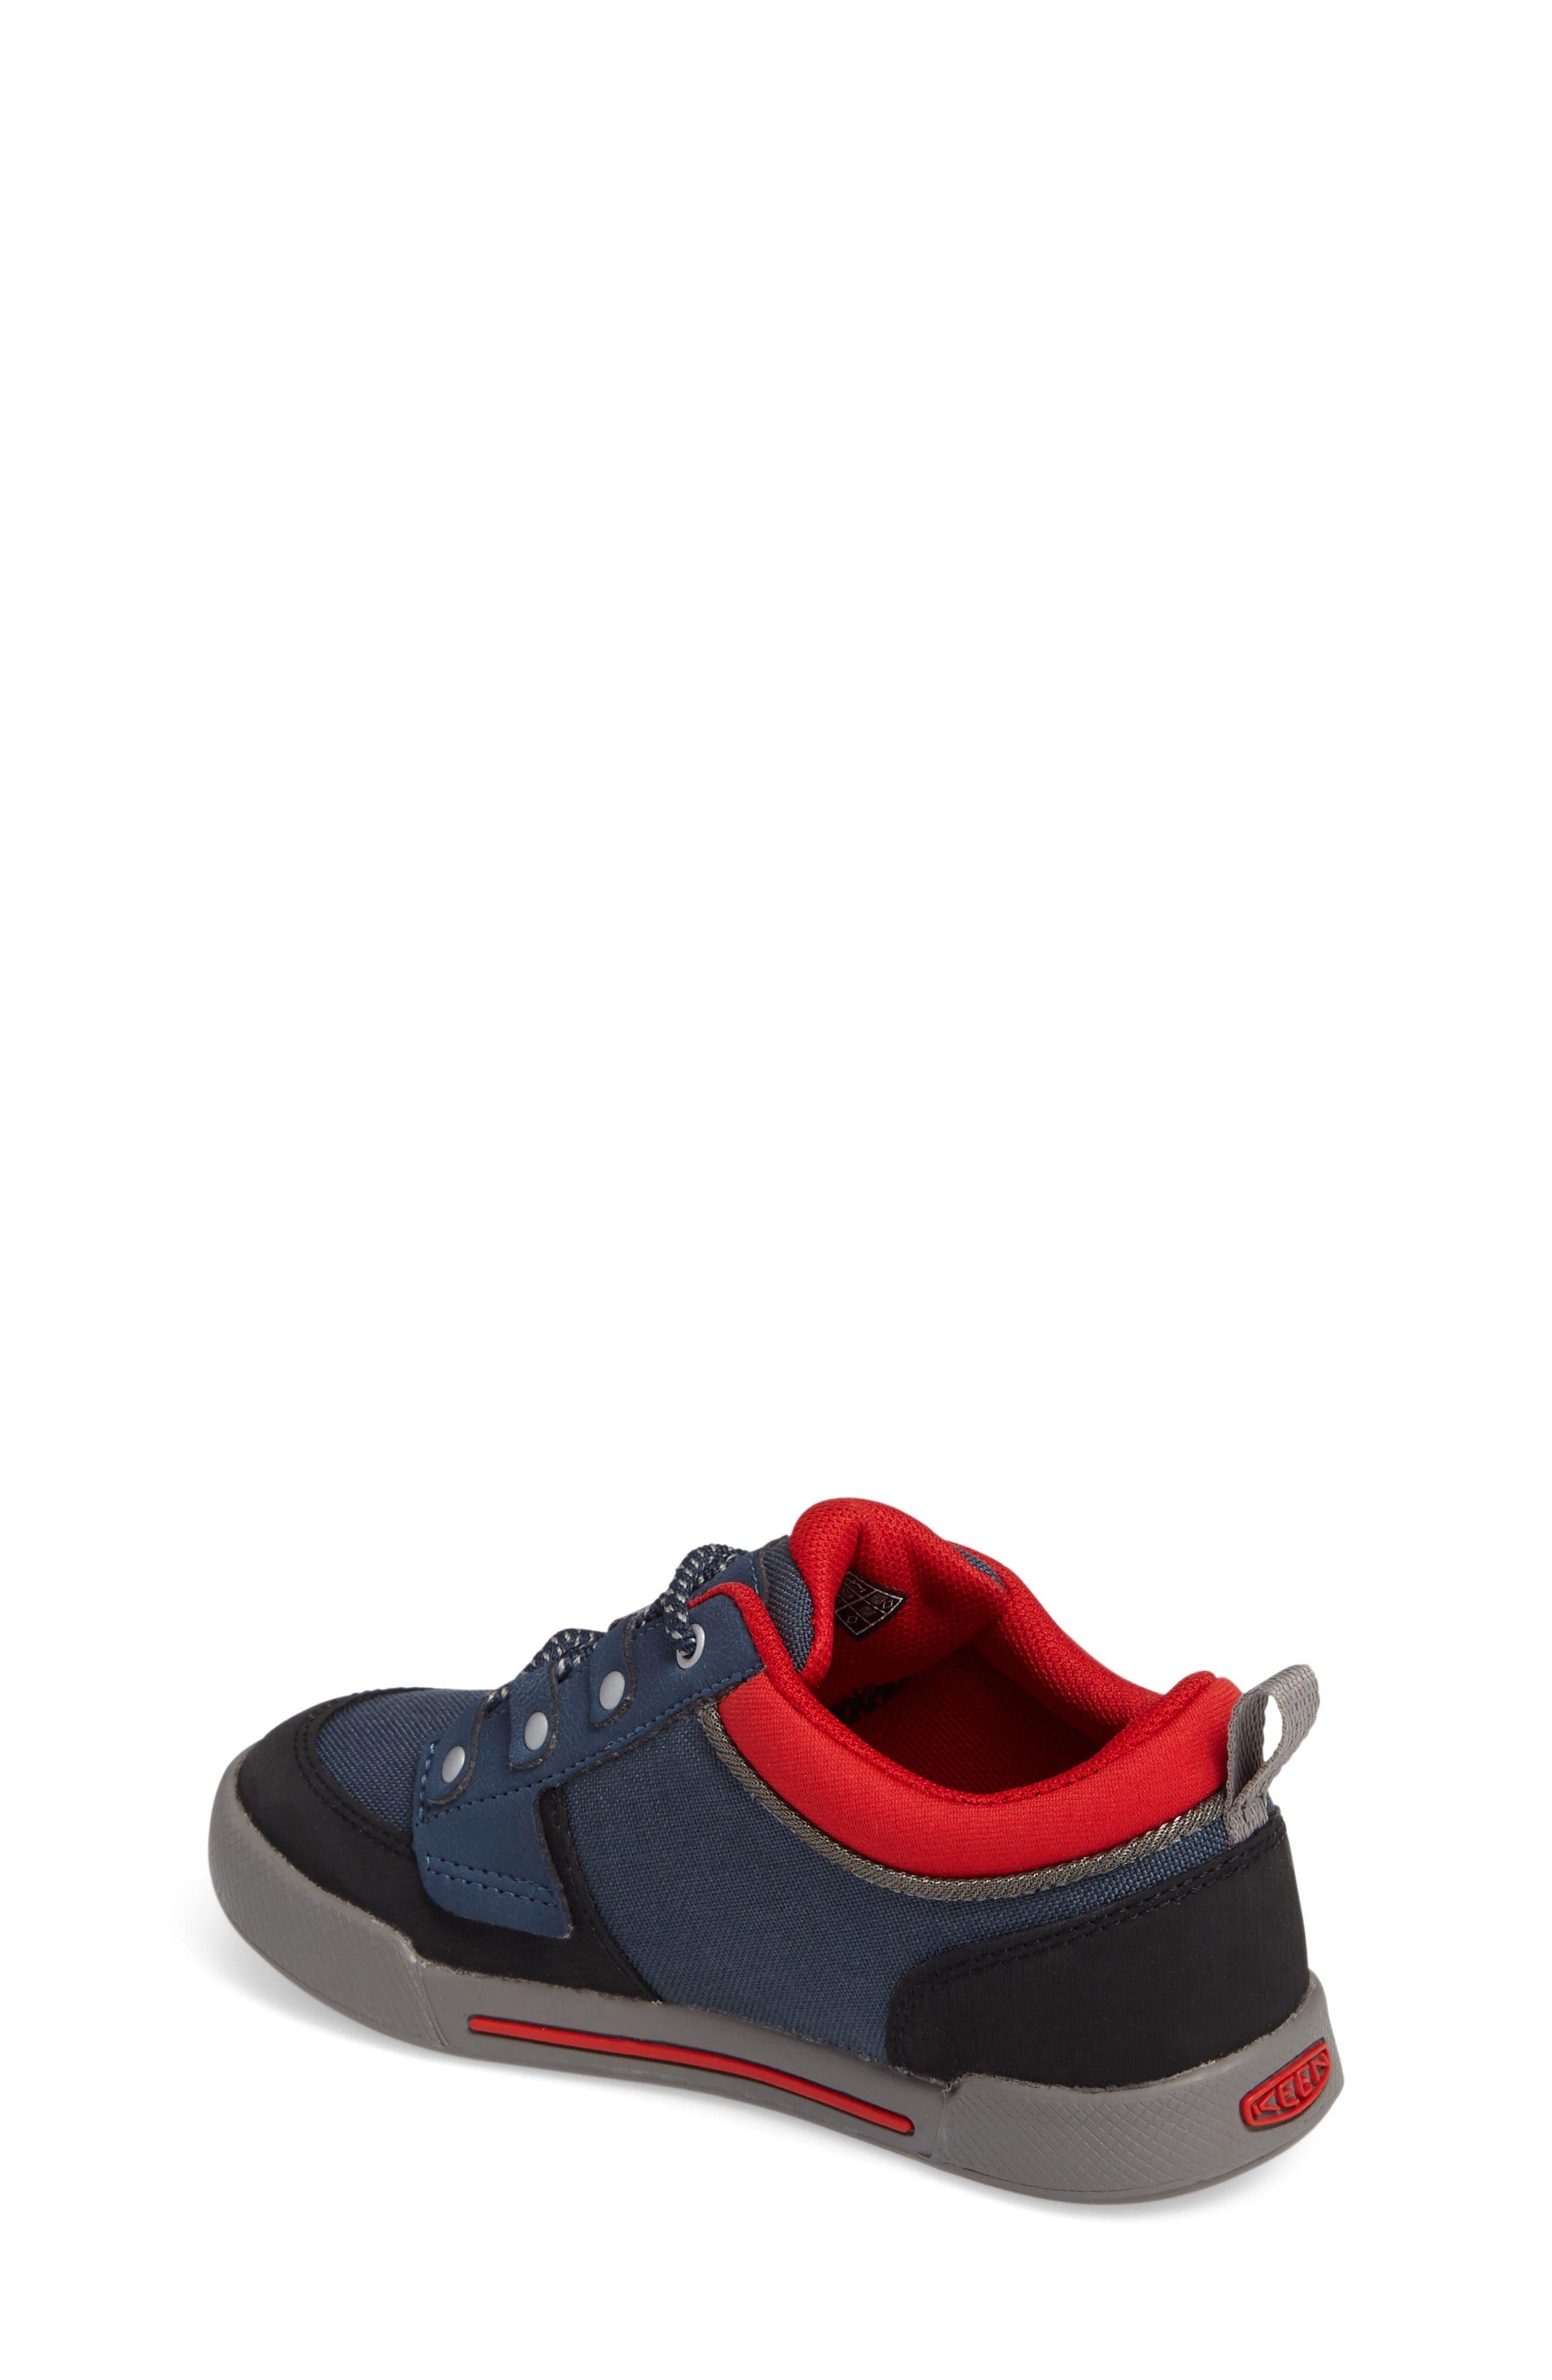 Encanto Wesley Sneaker,                             Alternate thumbnail 2, color,                             Midnight Navy/ Formula One